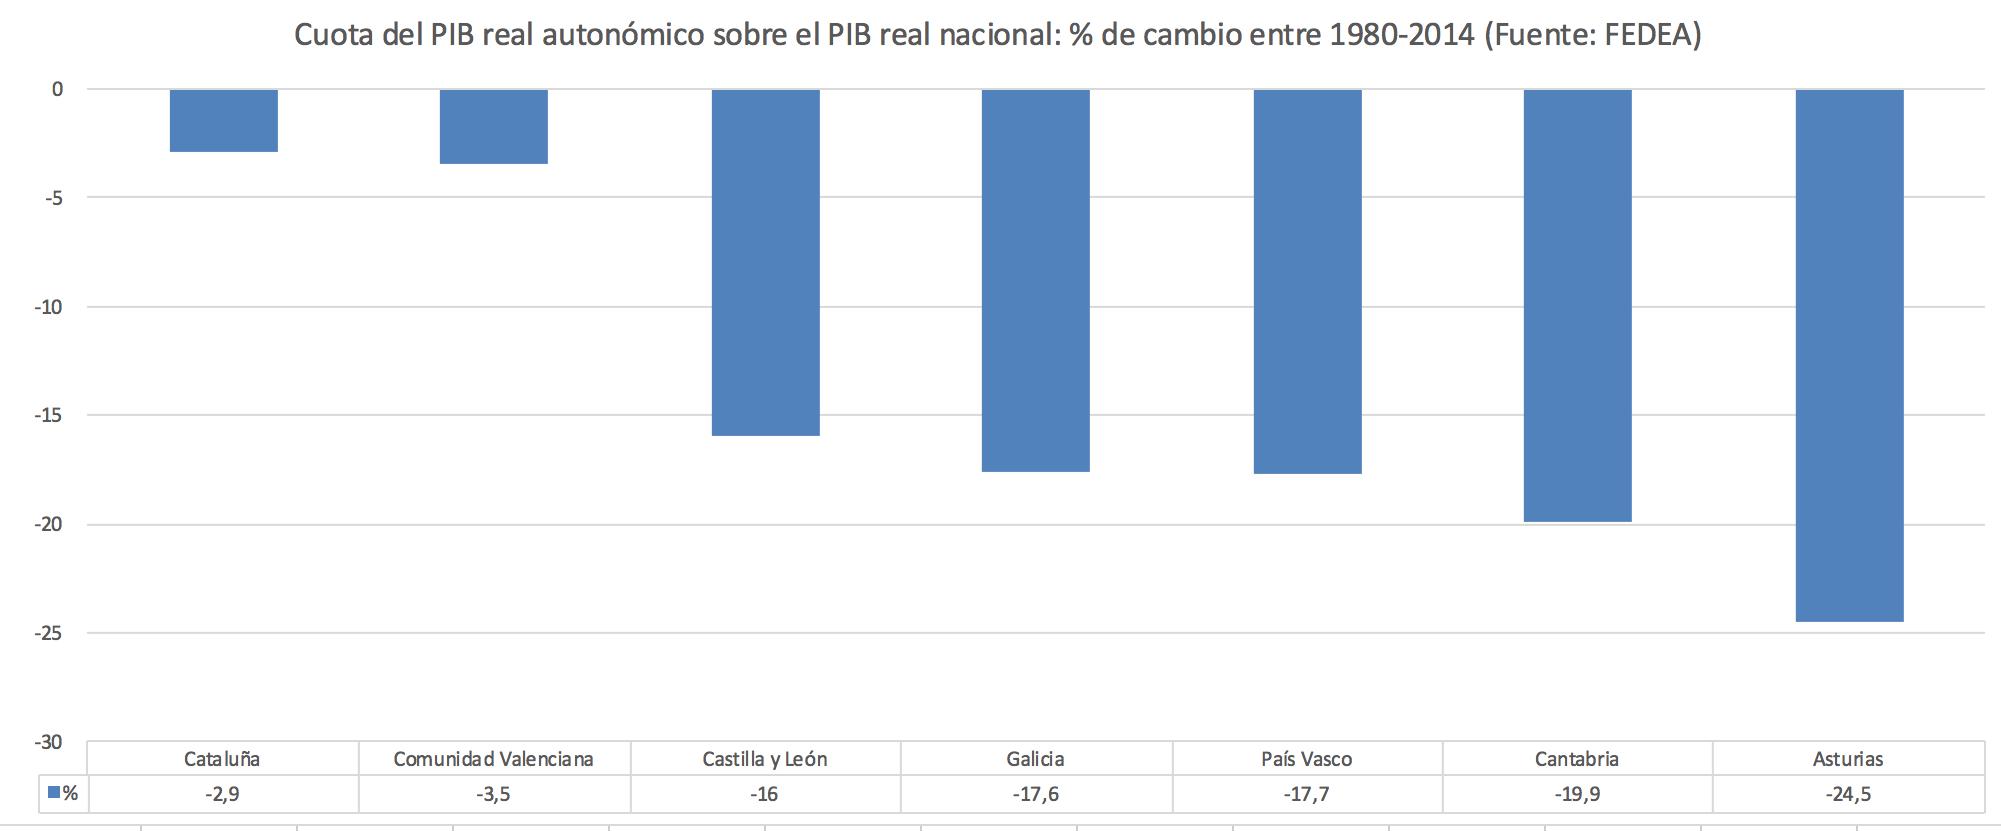 Cuota-PIB-real-CCAA-Espana-Madrid-Catalu